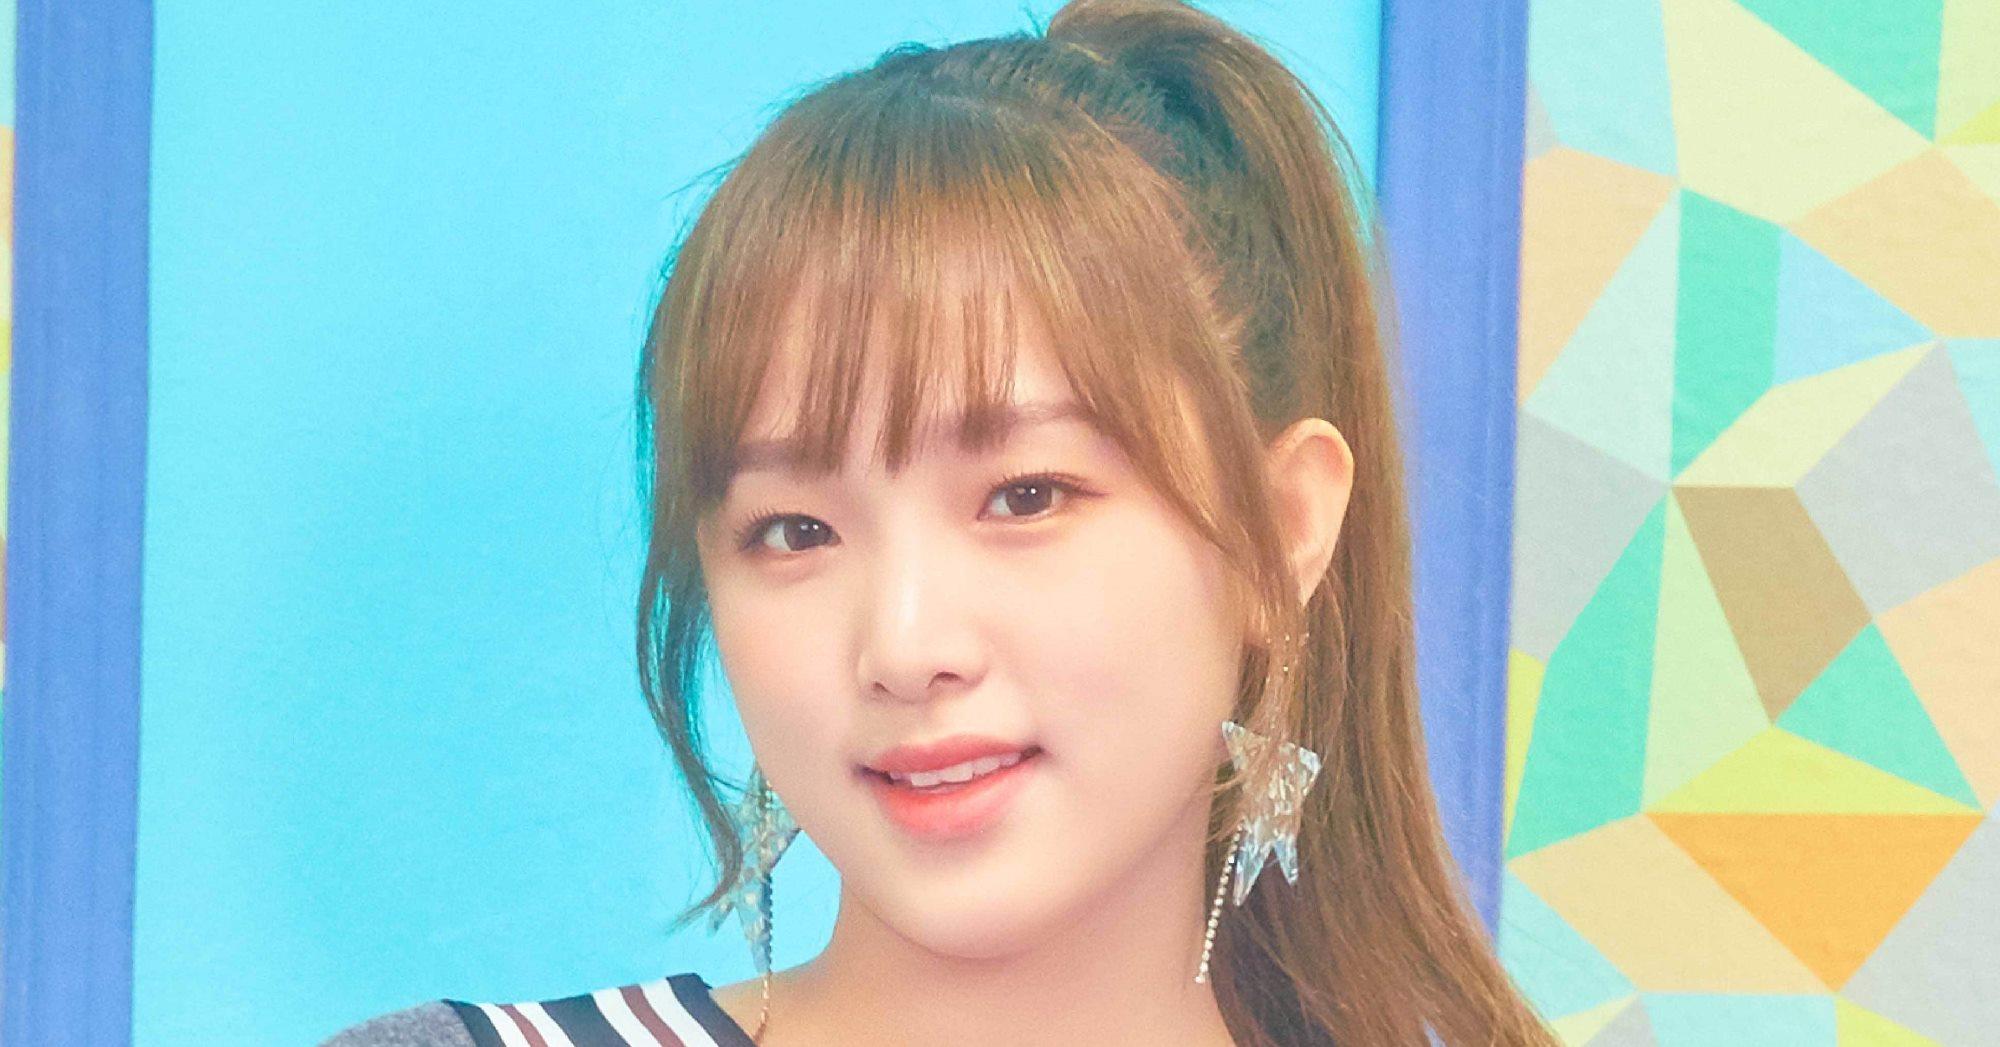 Oh My Girl Kpop Wallpaper Yena Iz One Profile K Pop Database Dbkpop Com